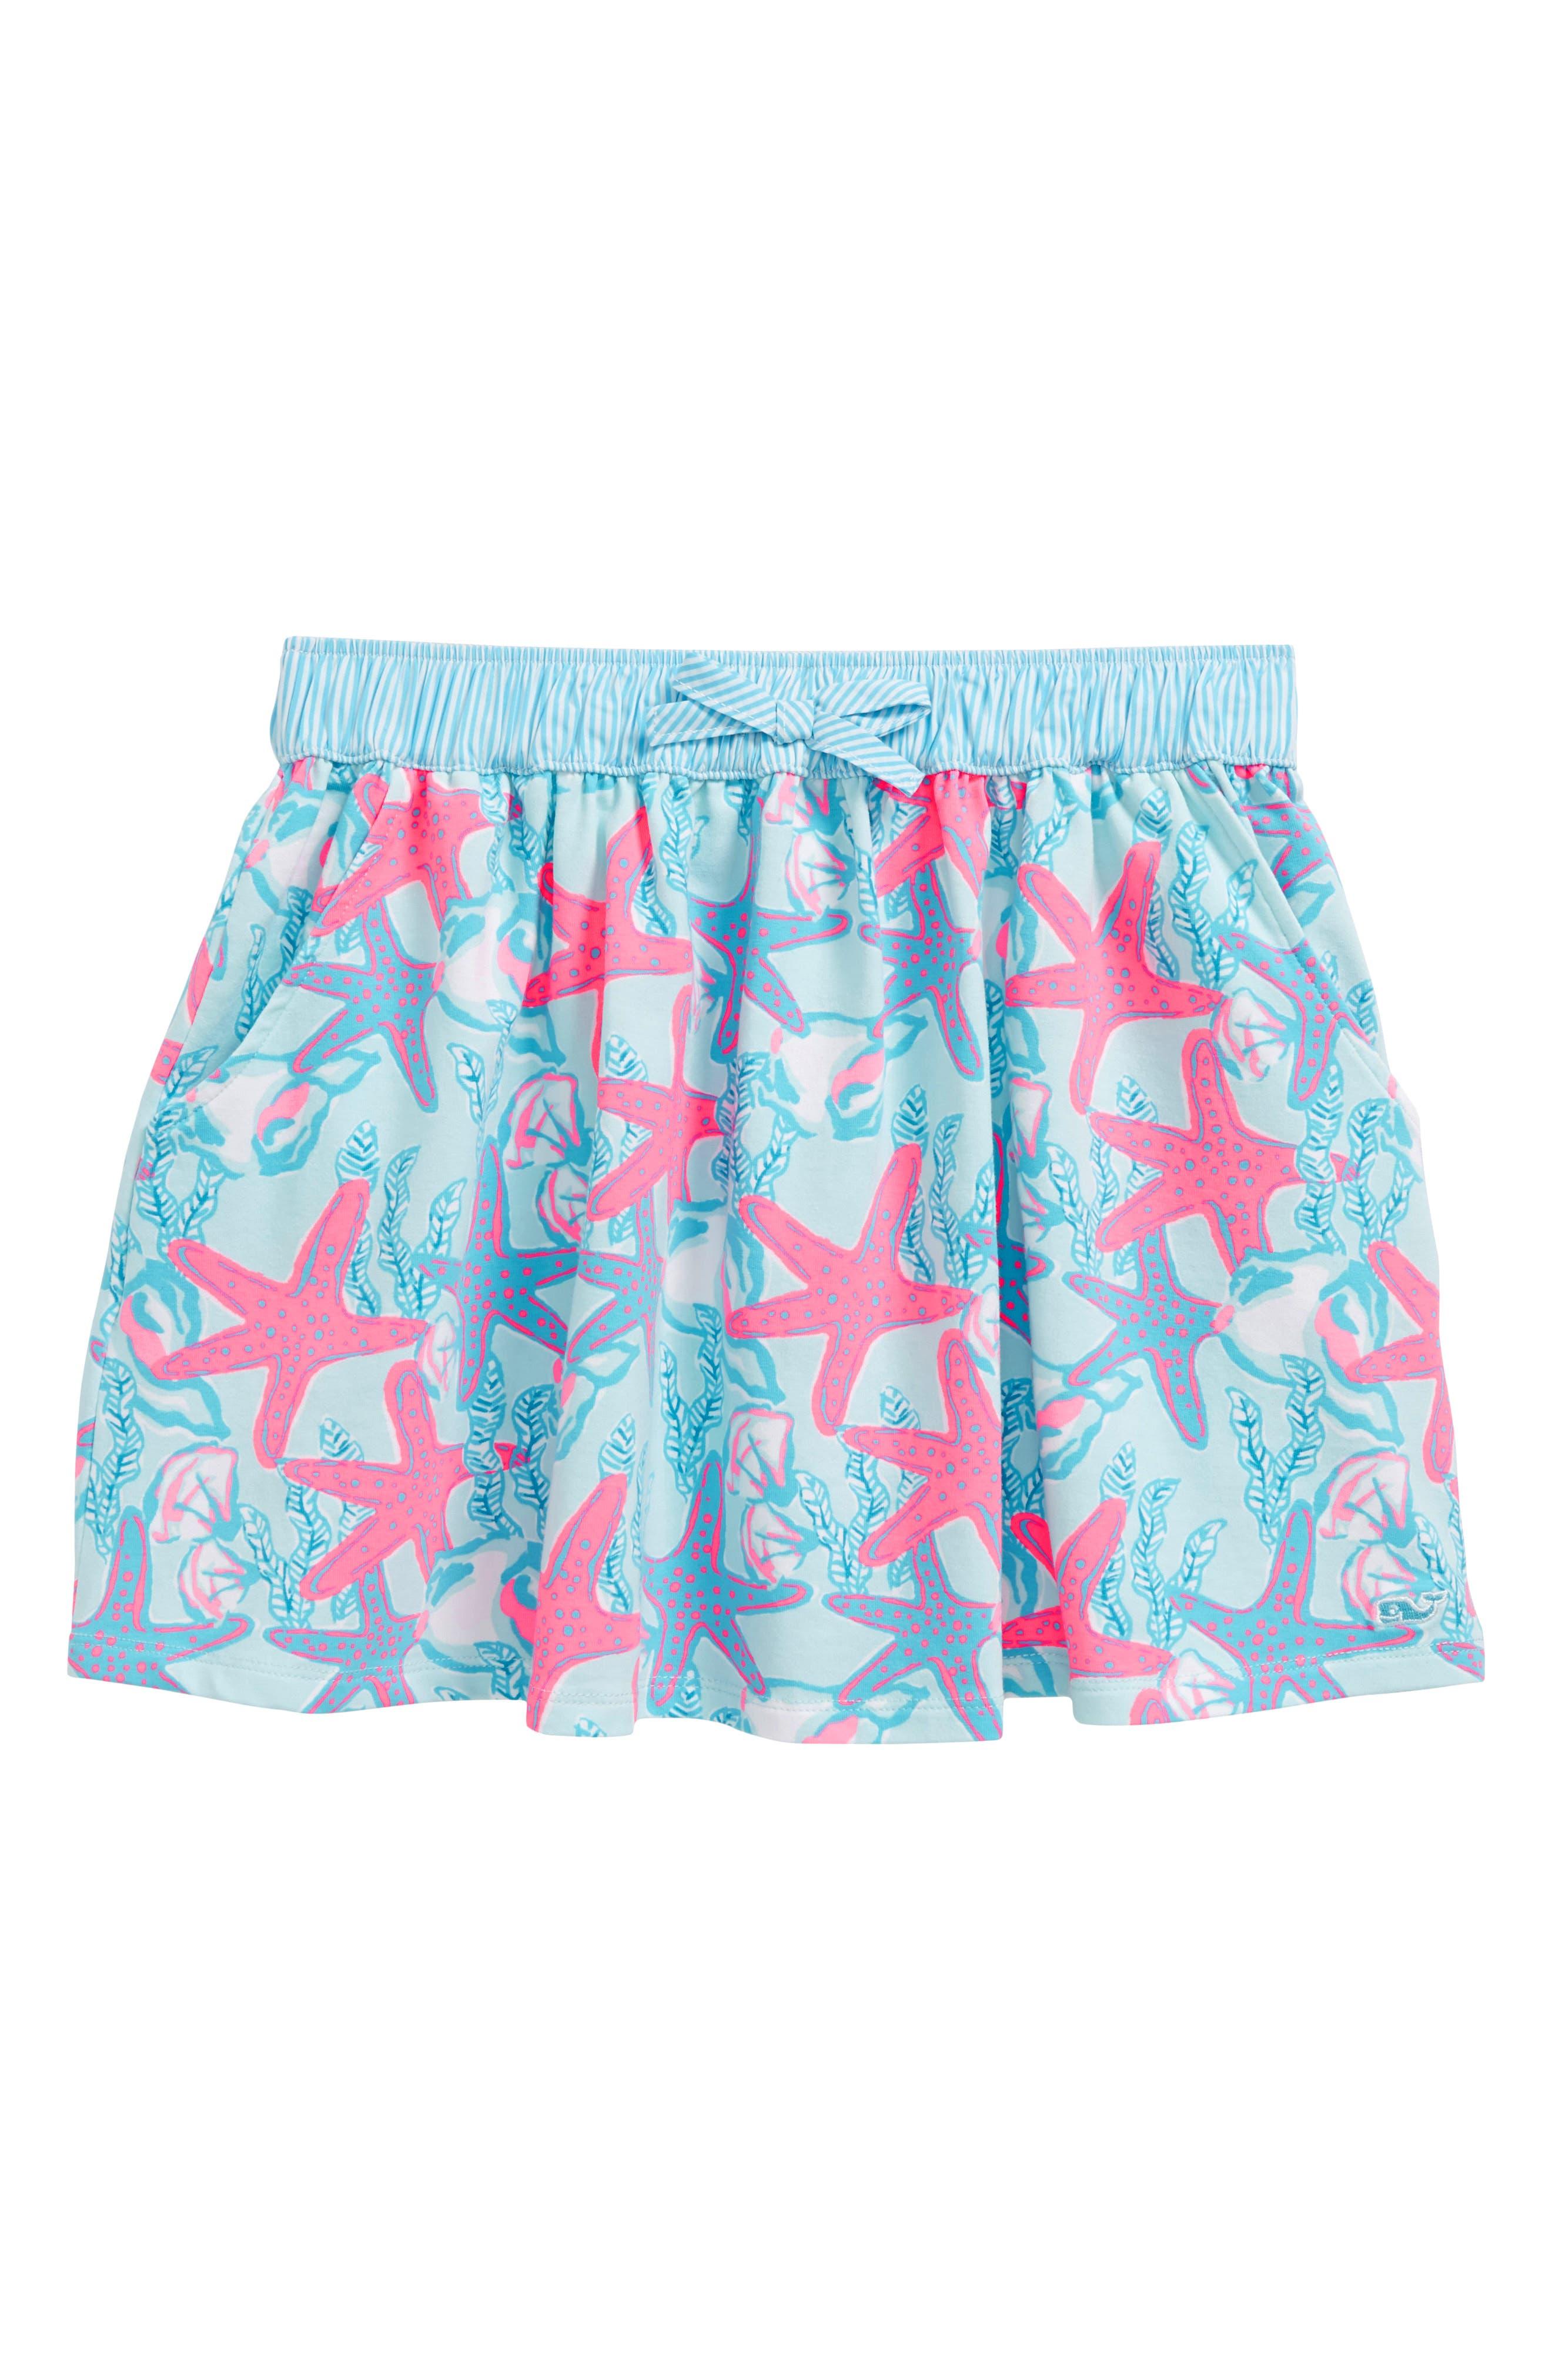 Main Image - vineyard vines Print Skirt (Little Girls & Big Girls)